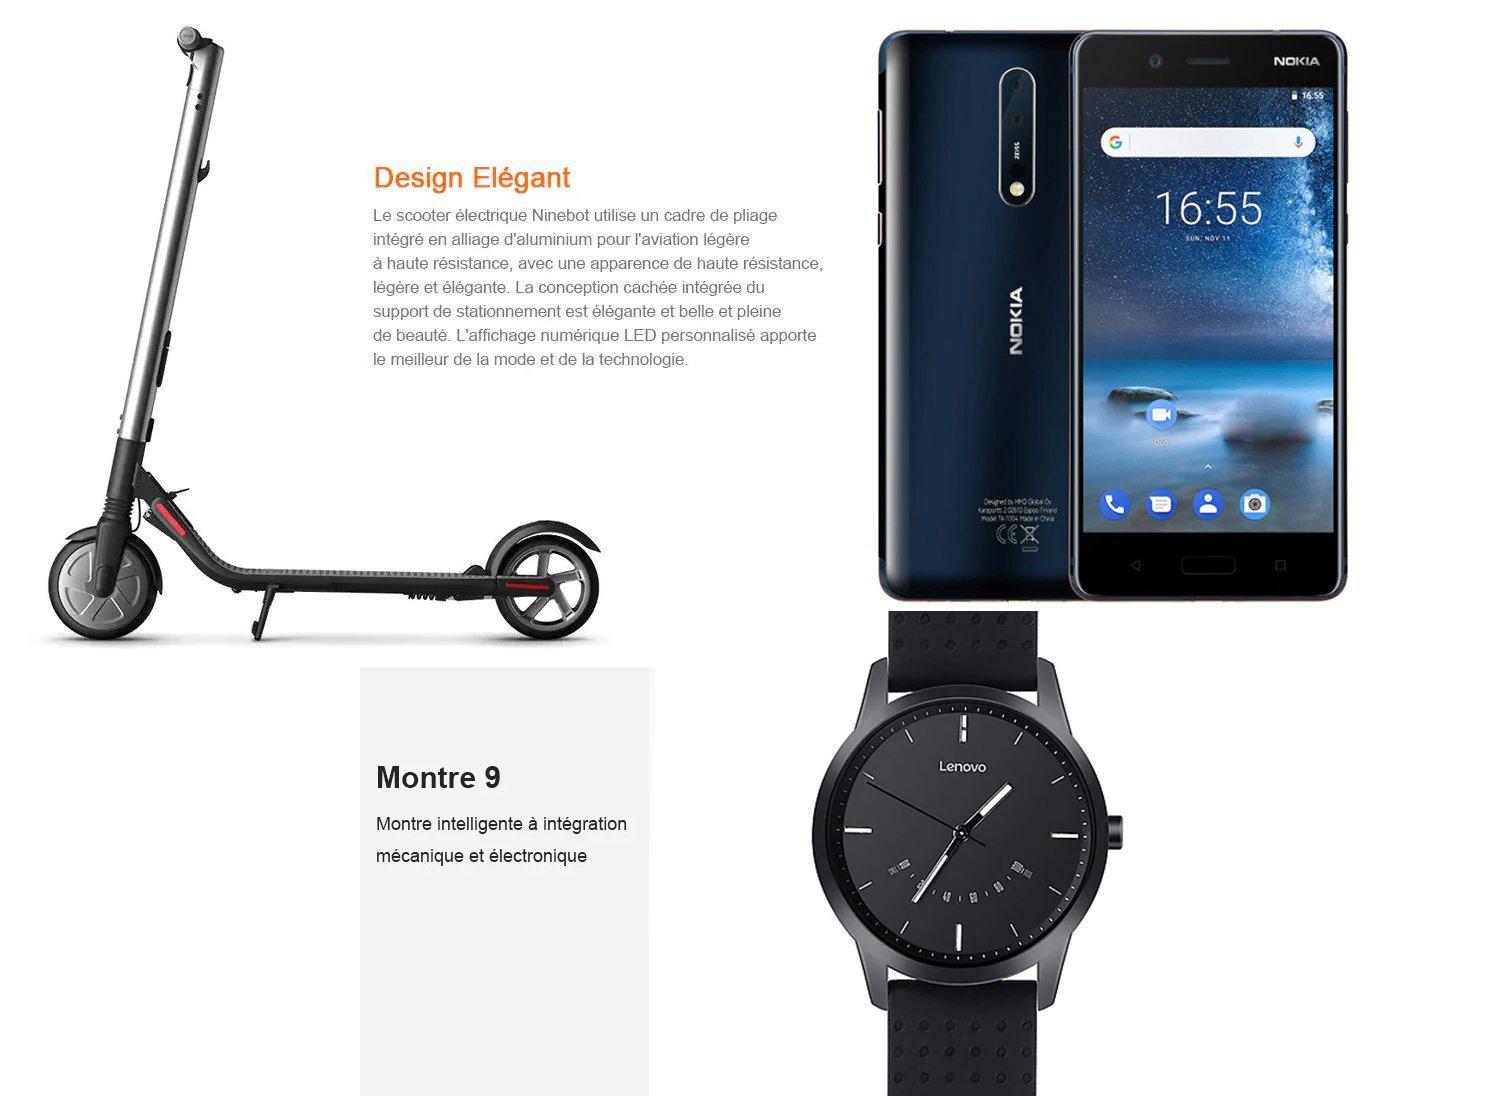 Bonne affaire: Nokia 8, Lenovo Watch 9 et Ninebot Segway ES2 Scooter